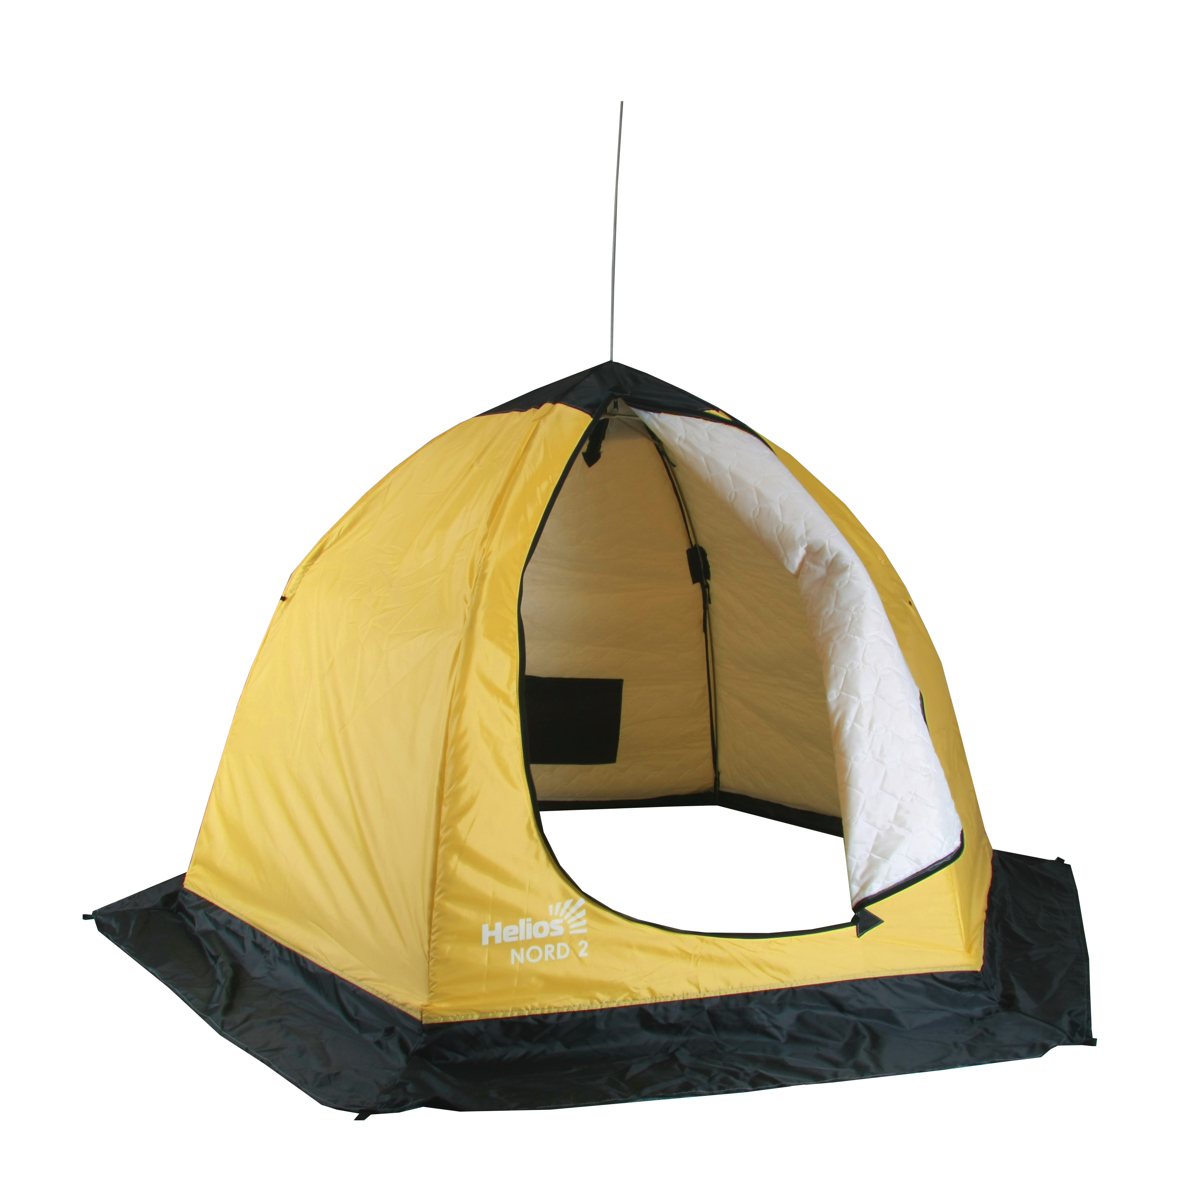 Палатка-зонт зимняя утепленная NORD-2 Helios (2-местная), Палатки для охоты и рыбалки - арт. 1128260375